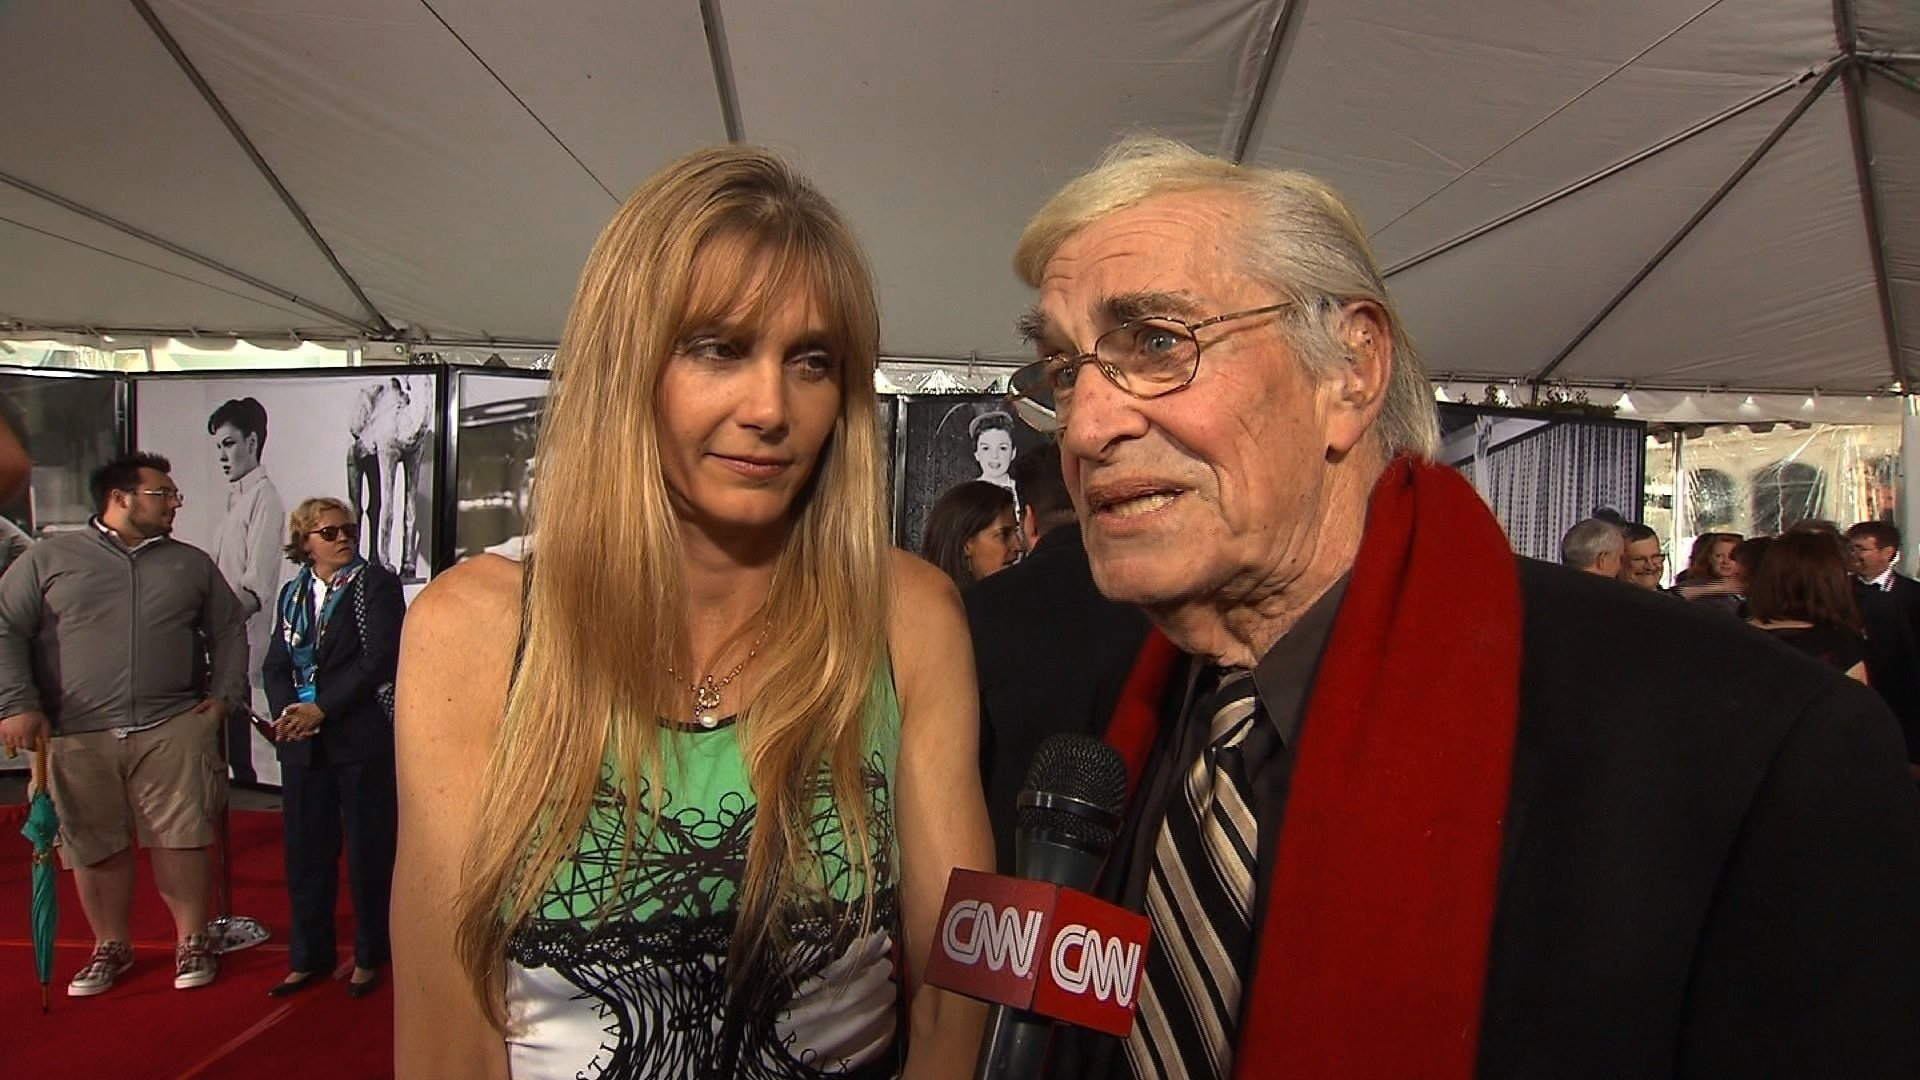 File photo: Martin Landau speaks to CNN at the 2010 TCM Classic Film Festival.